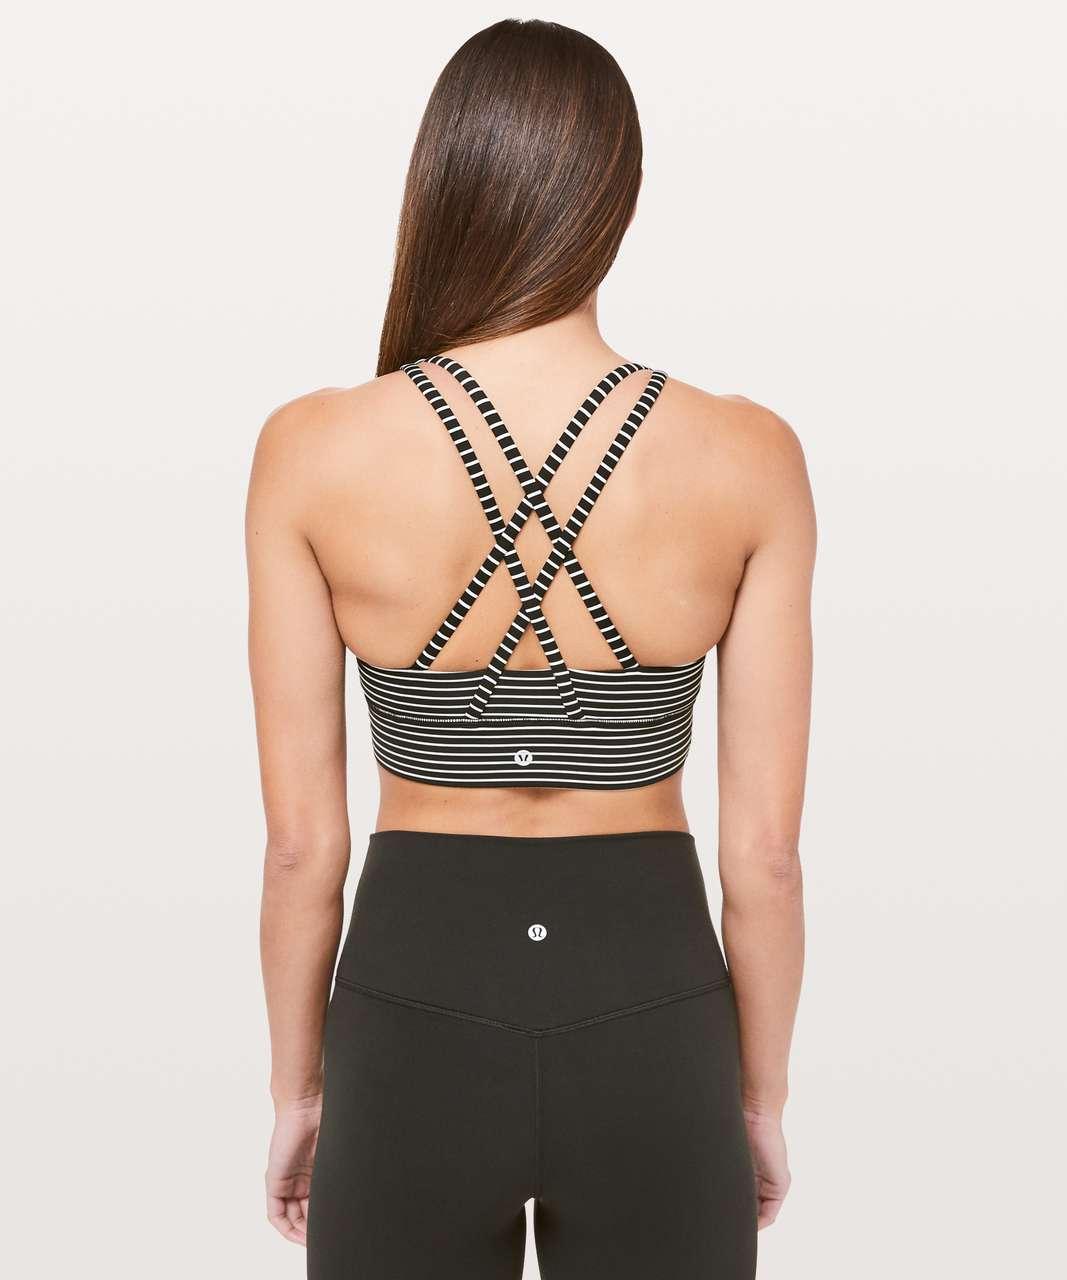 ee609ec20e Lululemon Energy Bra  Long Line - Mod Stripe Black White - lulu fanatics